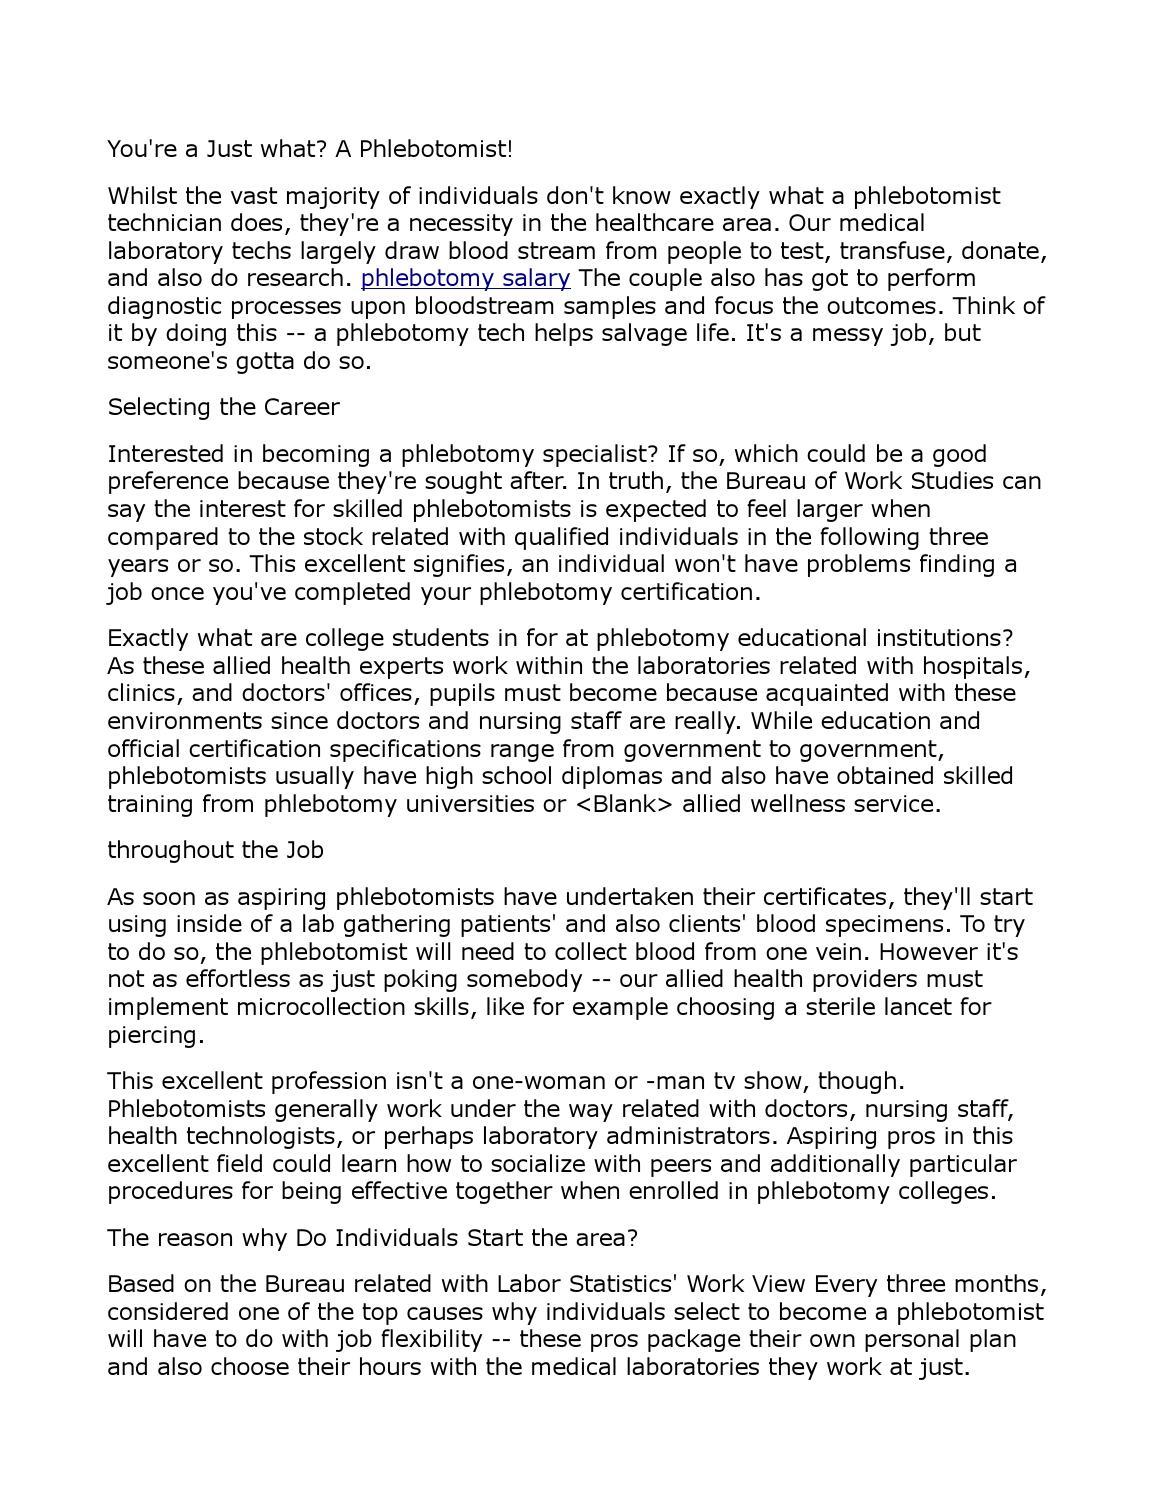 Phlebotomy Salary 71 By Rosemary1058 Issuu